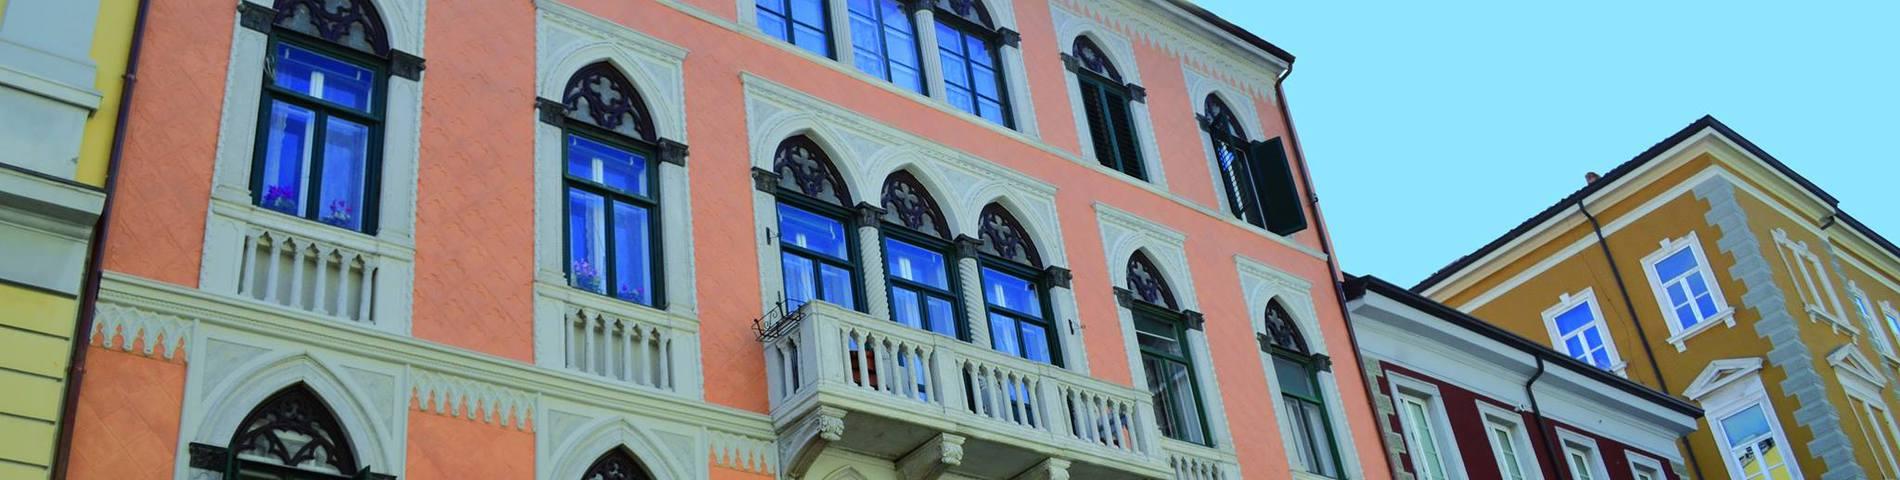 Piccola Università Italiana - Le Venezie зображення 1